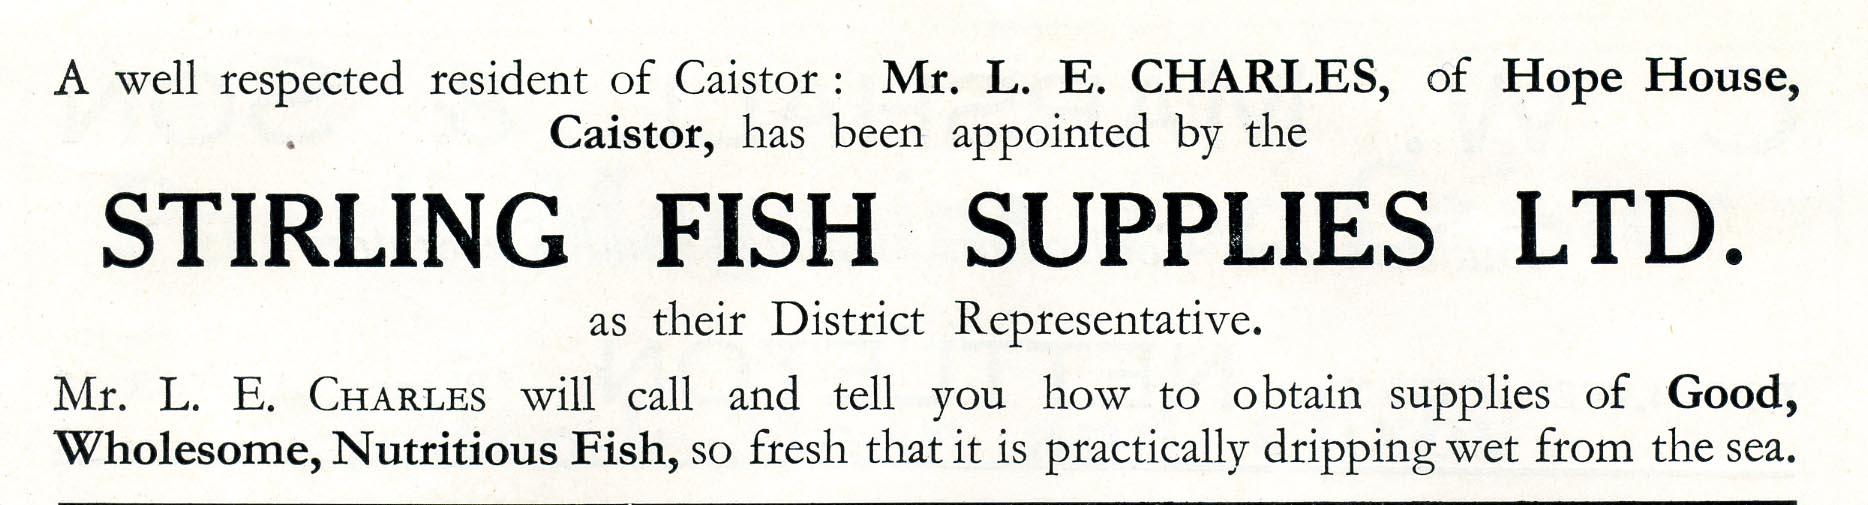 Advert 1935 L E Charles.jpg